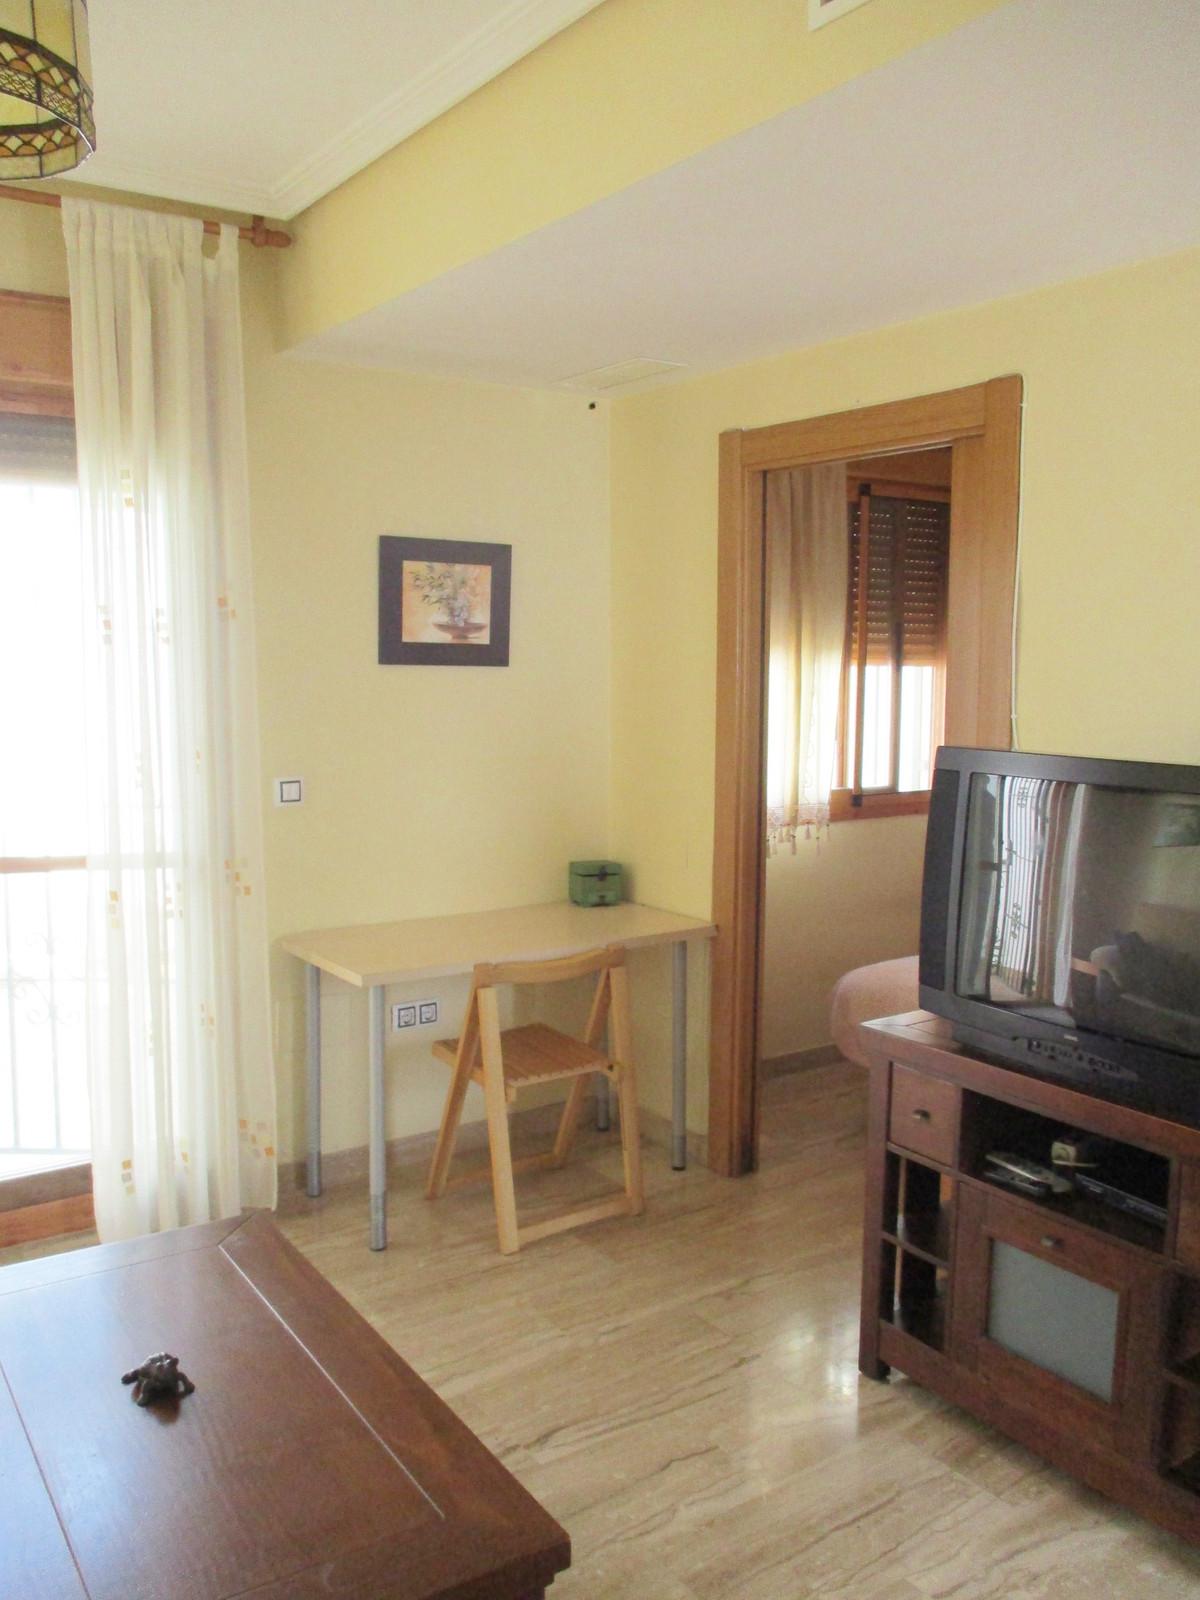 R3166243: Apartment for sale in Benalmadena Costa